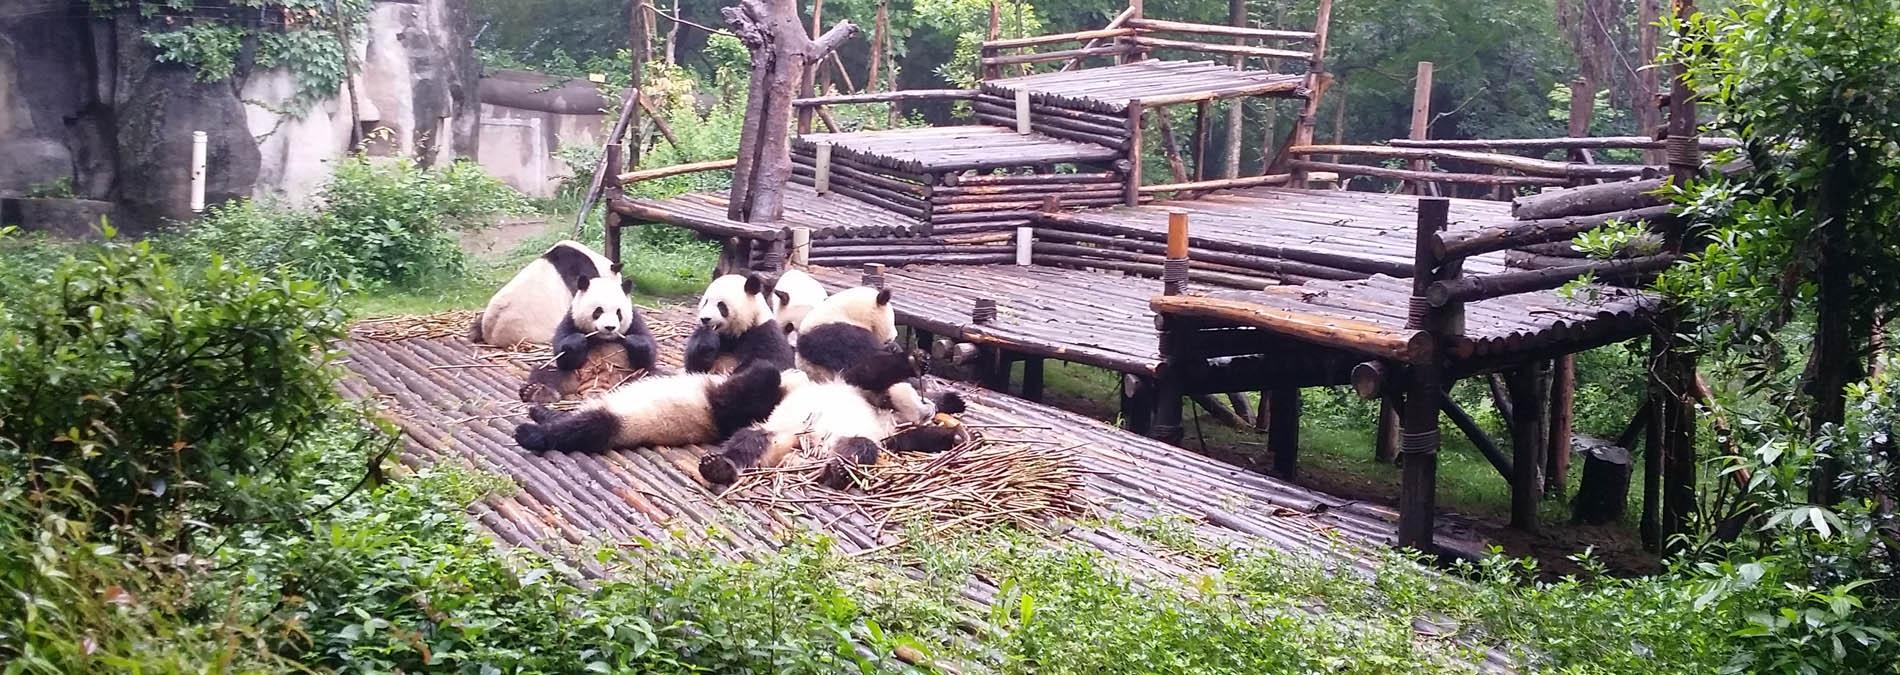 chengdu panda holding cost,chengdu panda volunteer program